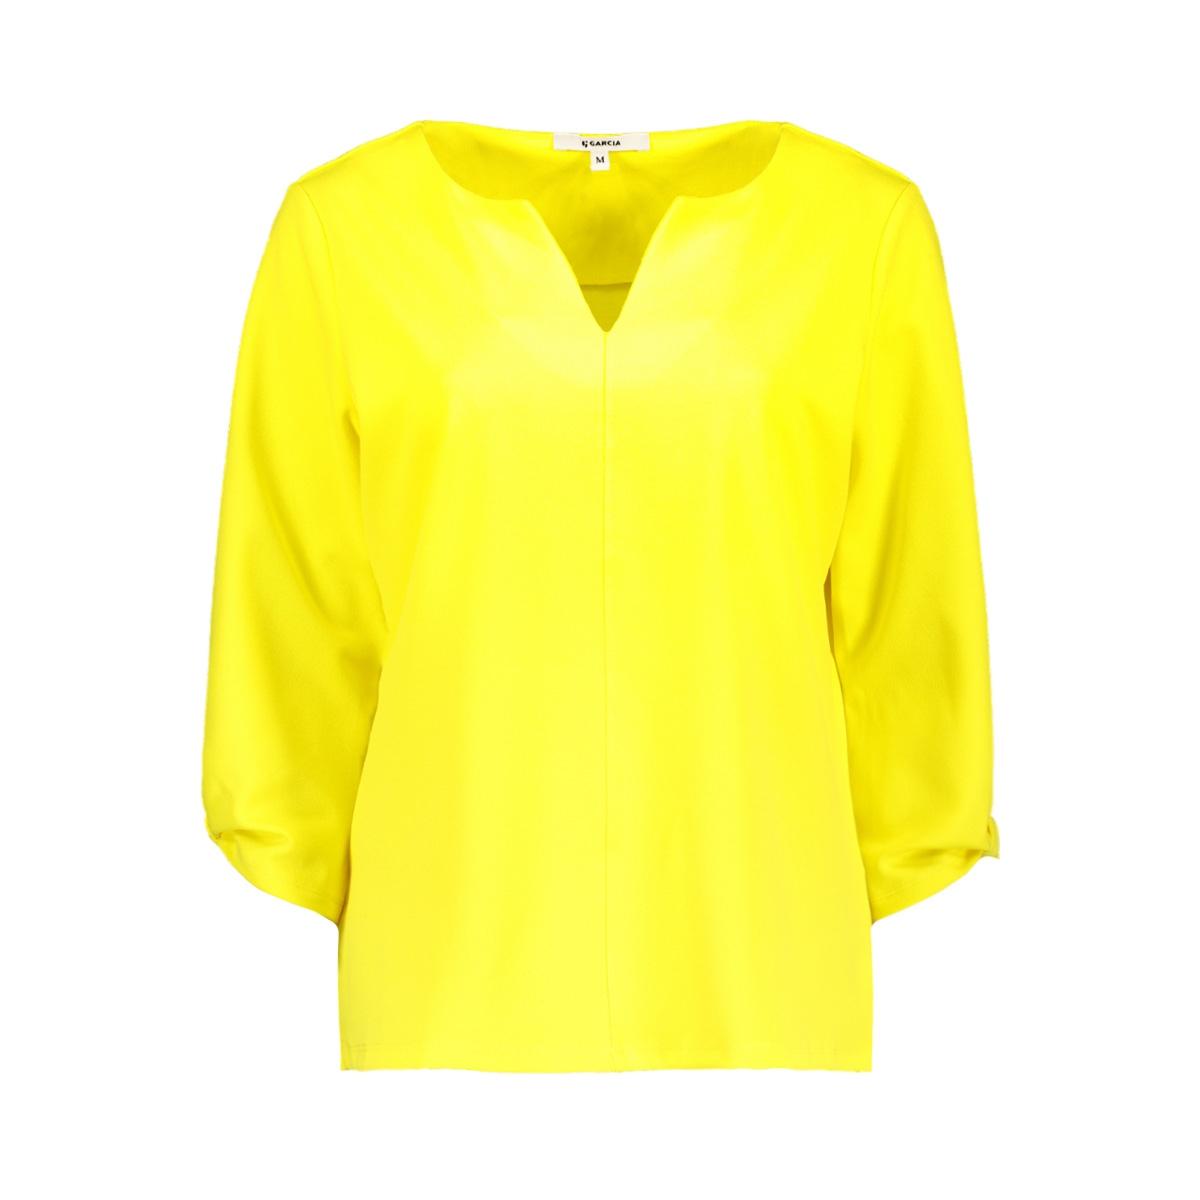 gs900102 garcia blouse 2846 sunny yellow